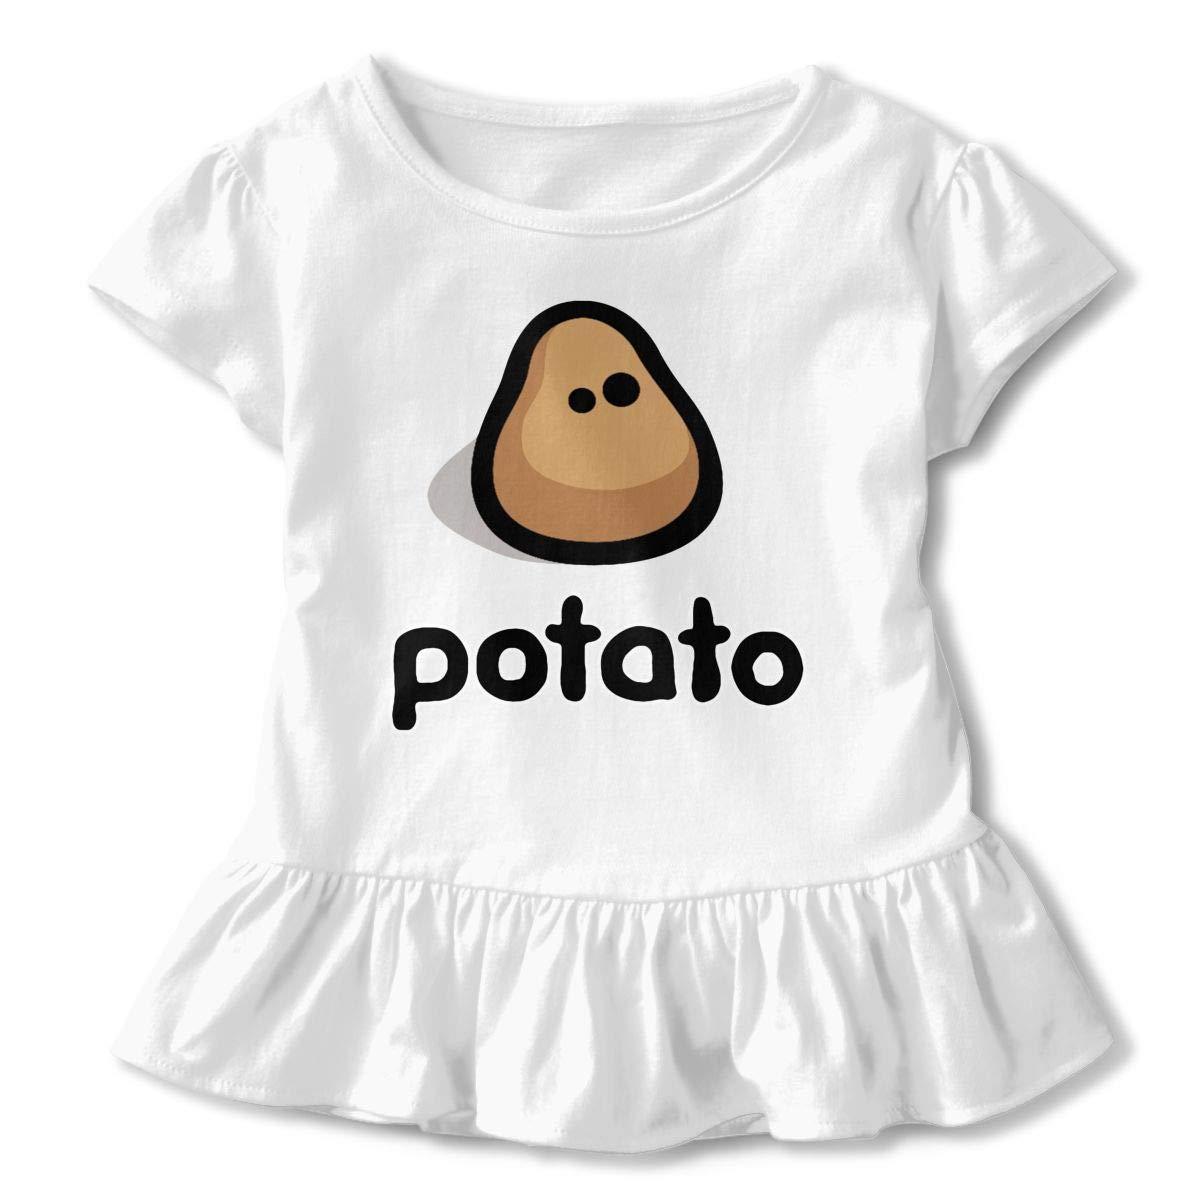 Dat Potato Guy Toddler Baby Girls Cotton Ruffle Short Sleeve Top Basic T-Shirt 2-6T